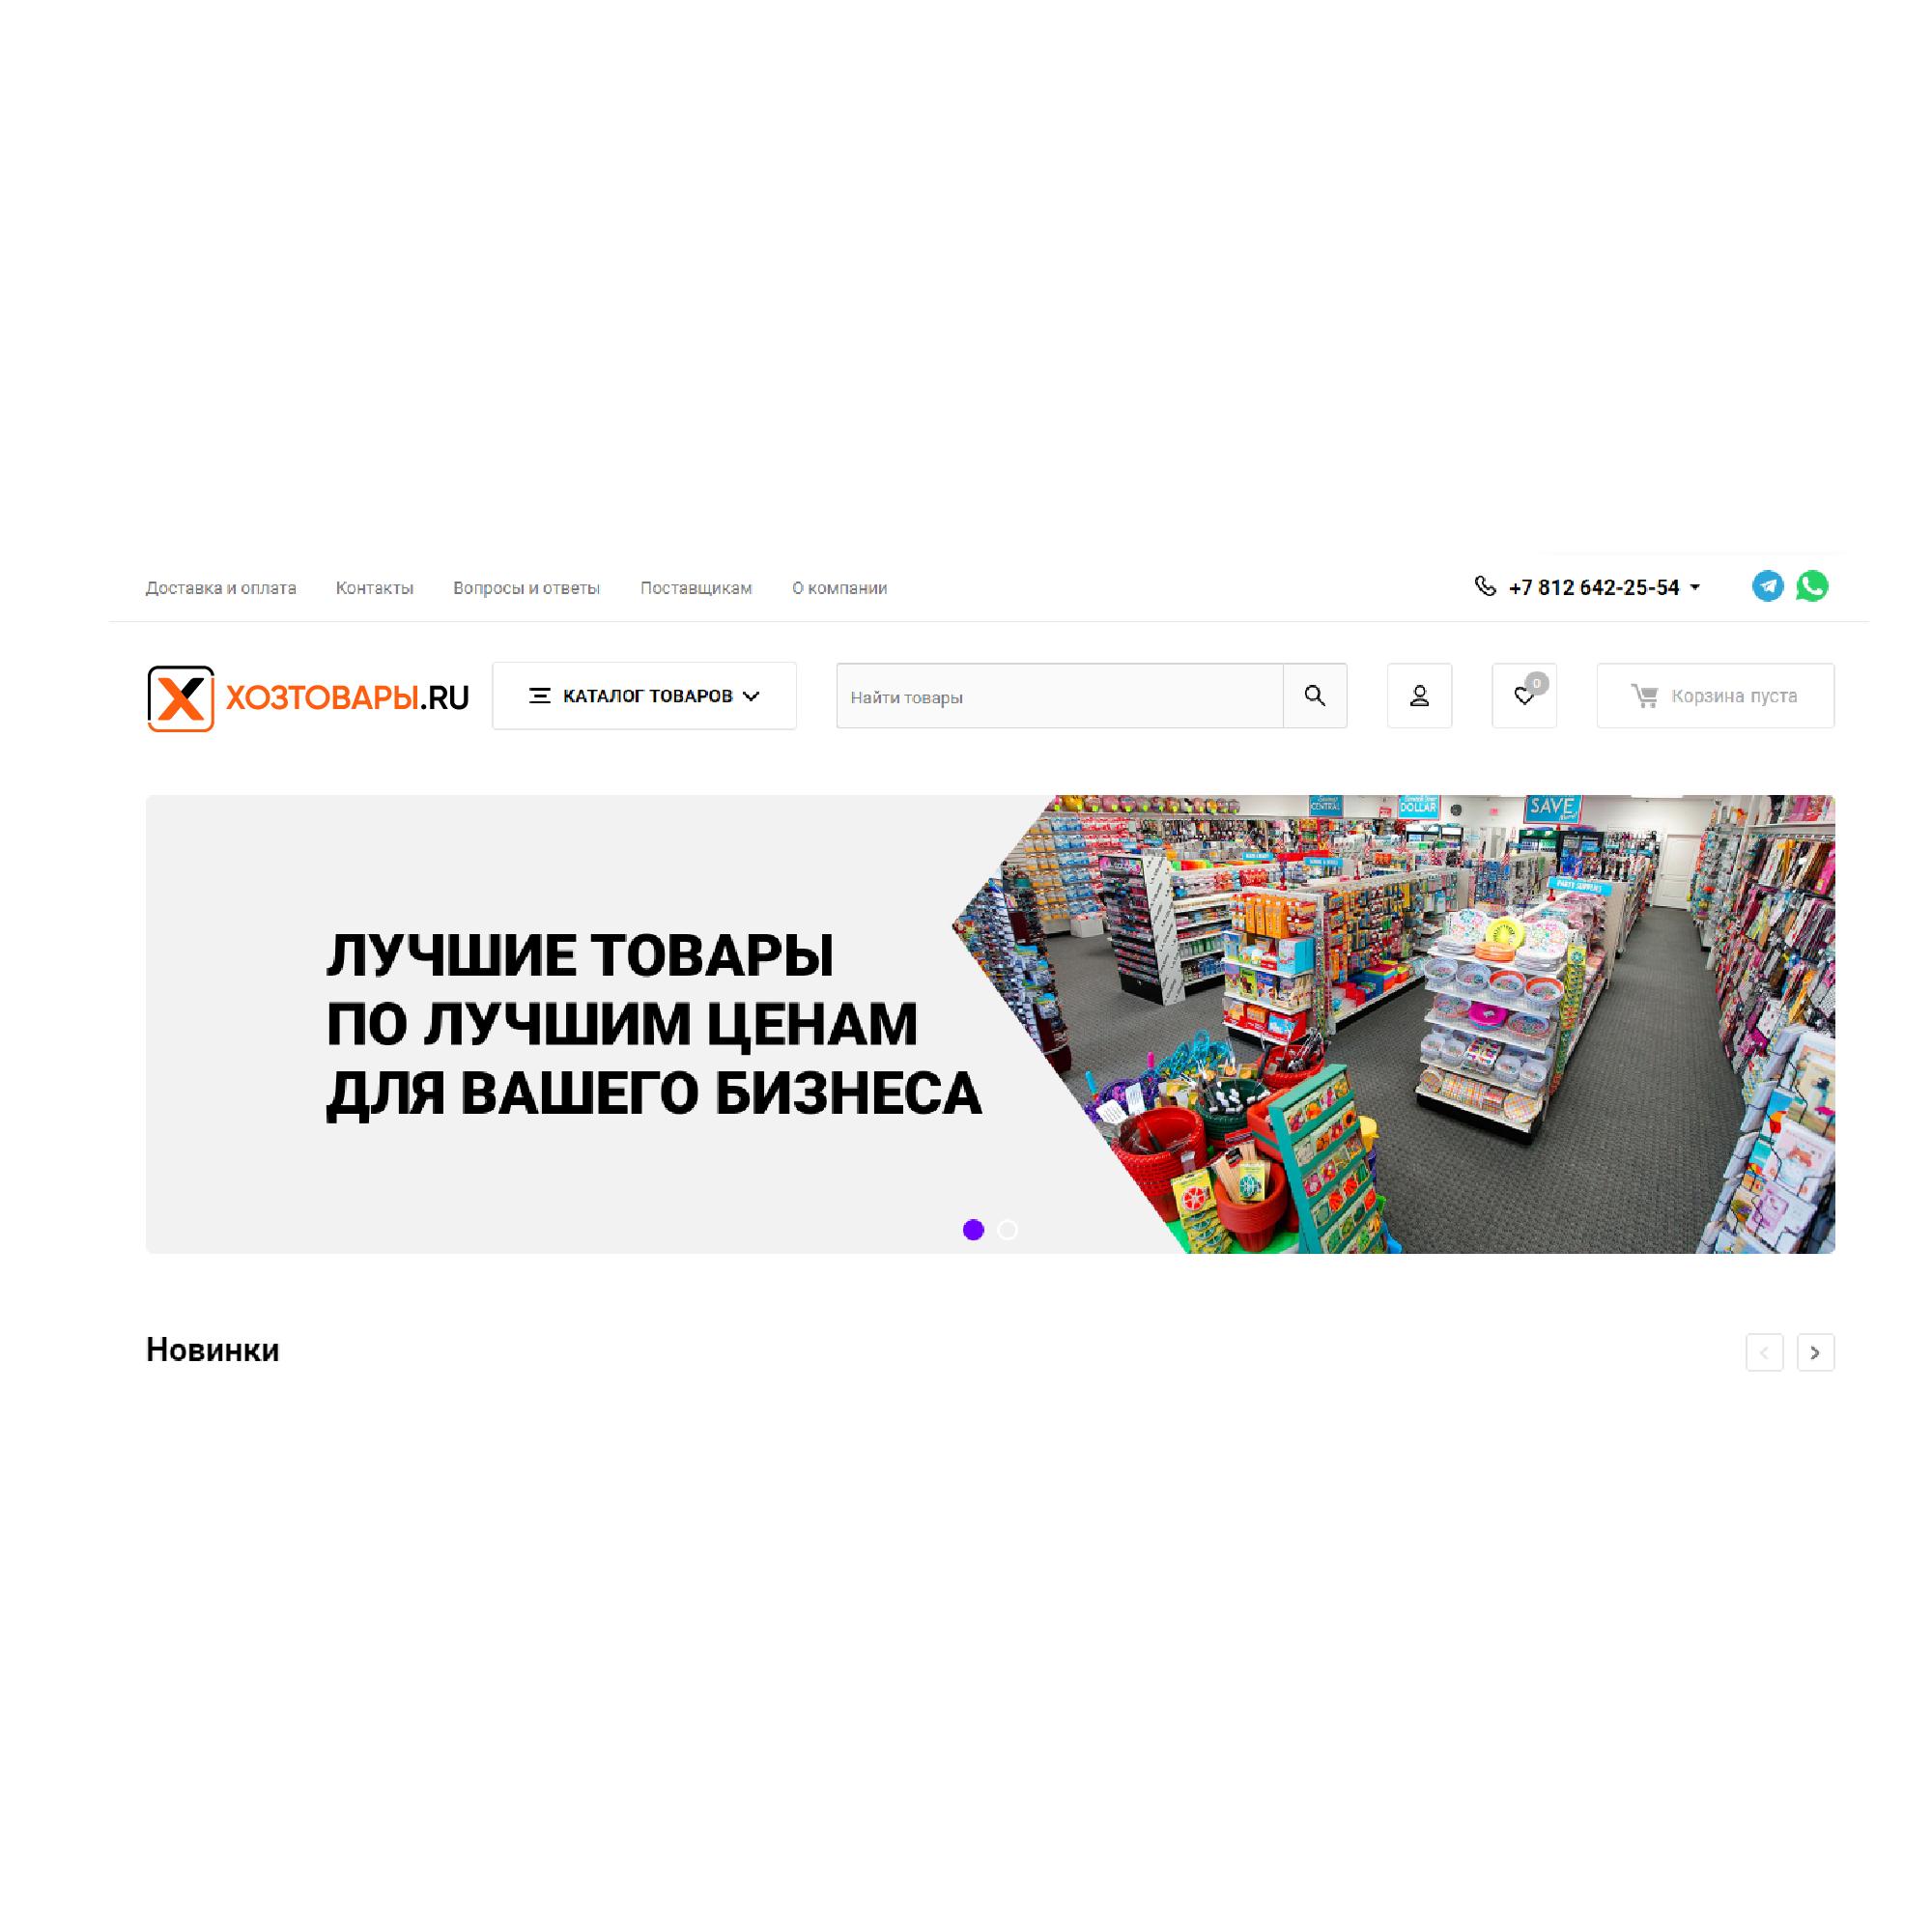 Разработка логотипа для оптового интернет-магазина «Хозтовары.ру» фото f_0646076b2d276d10.png